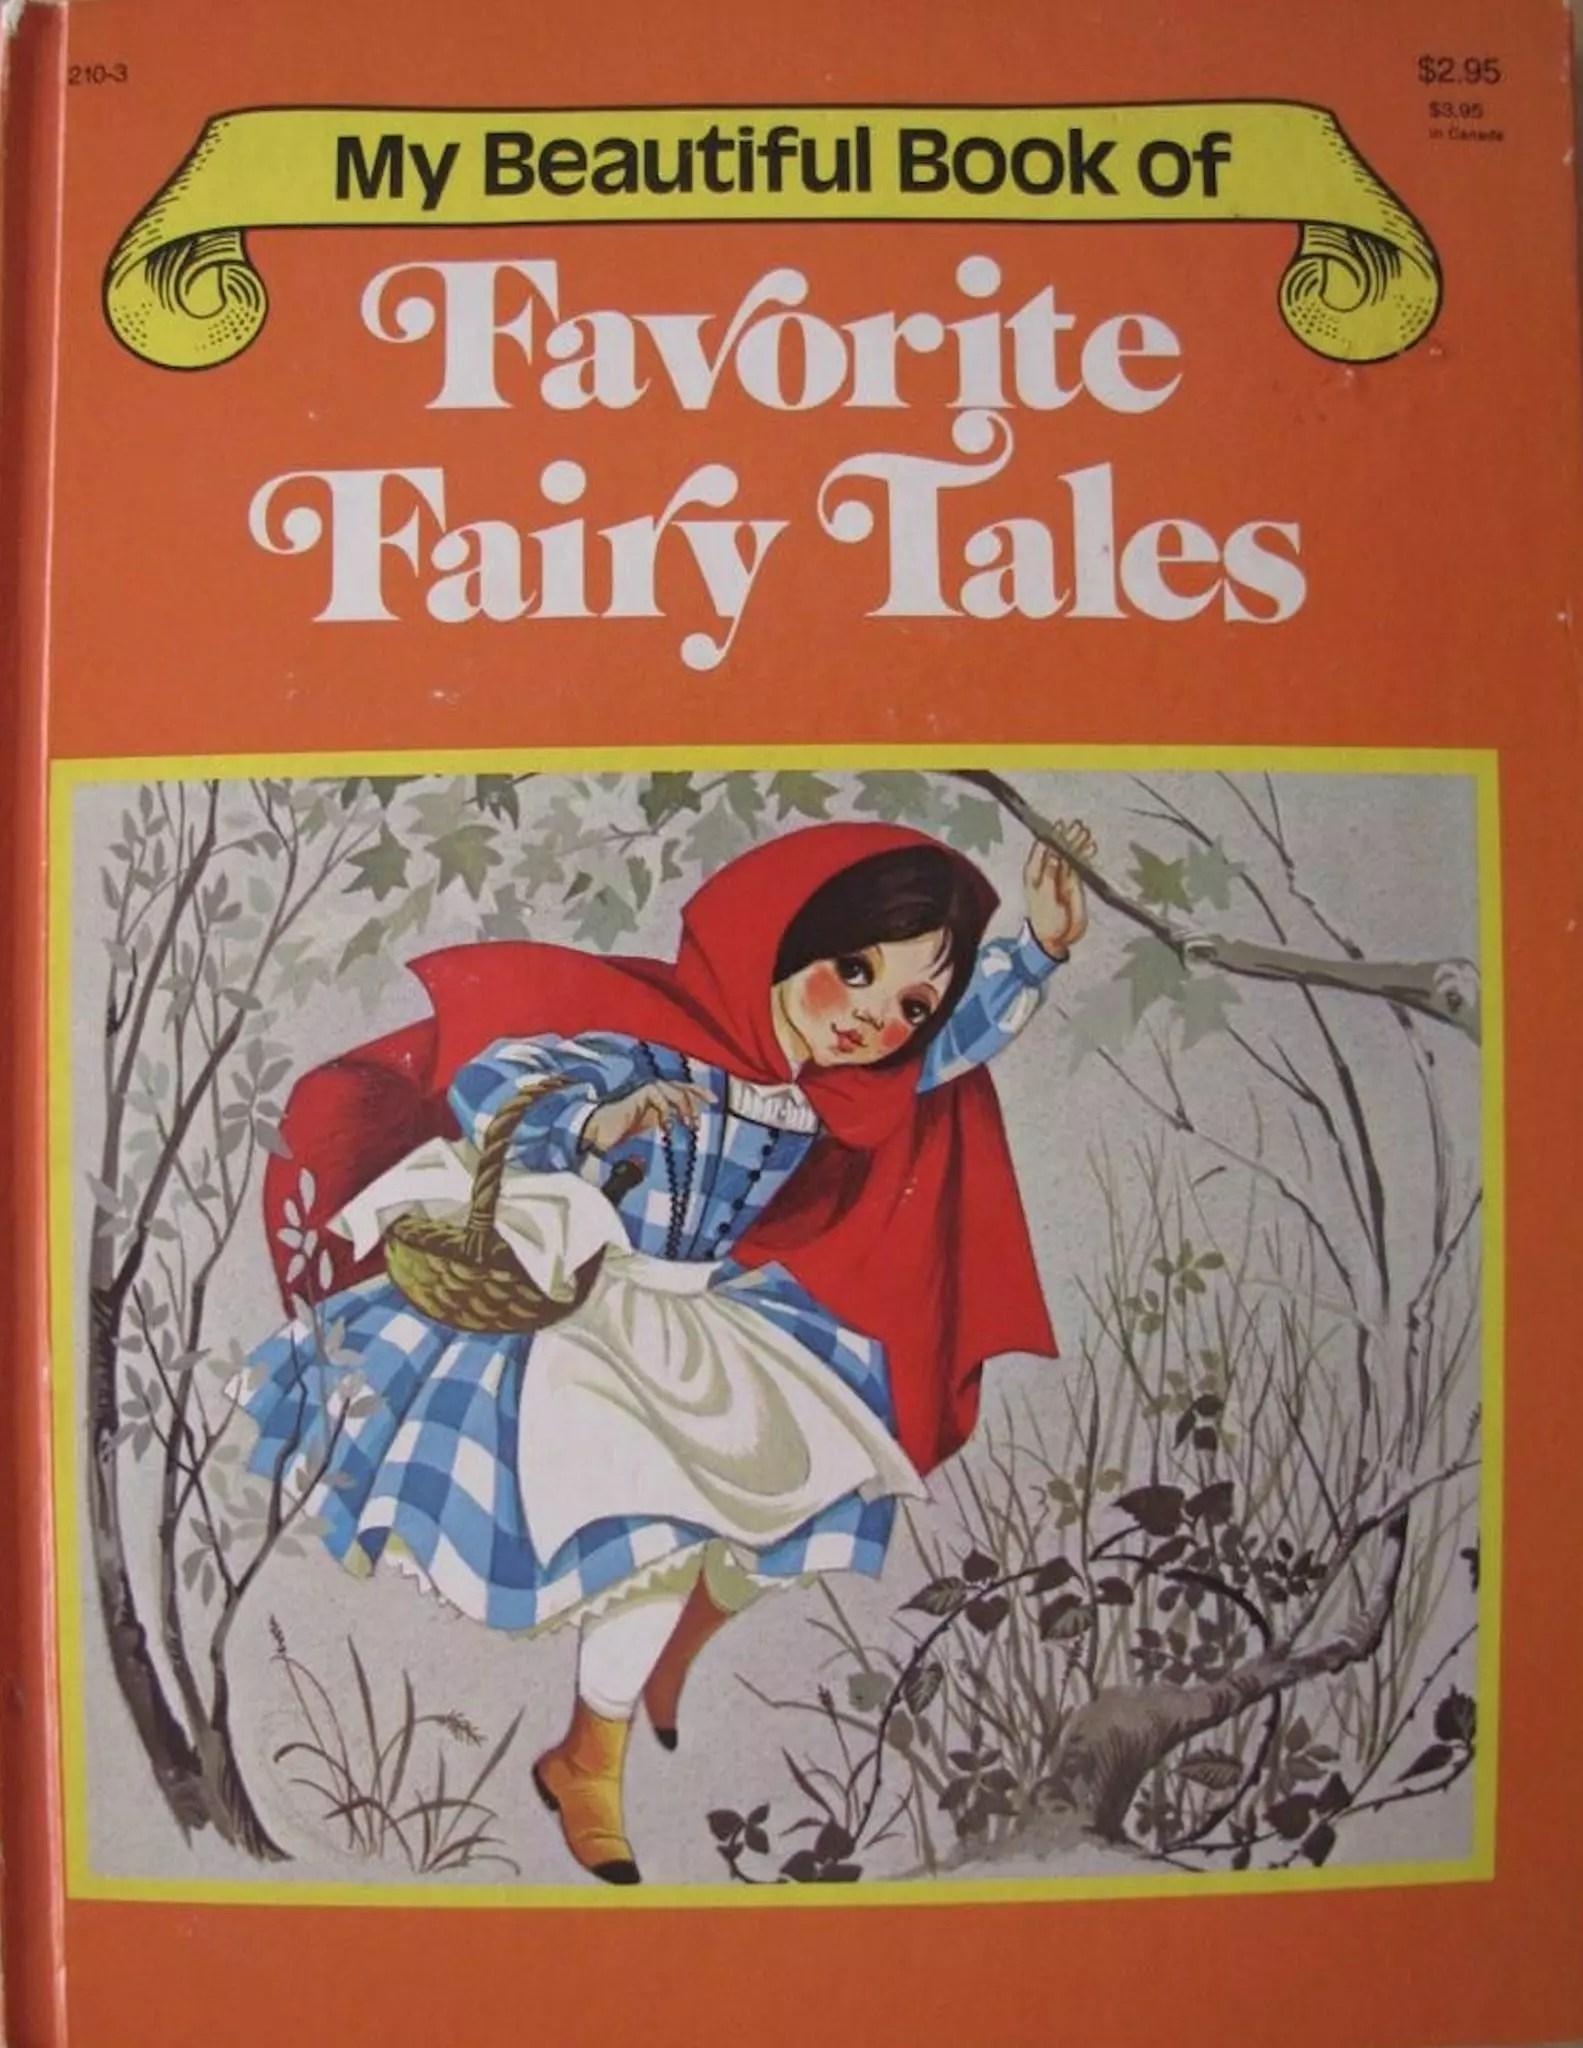 GJT My Beautiful Book of Favorite Fairy Tales